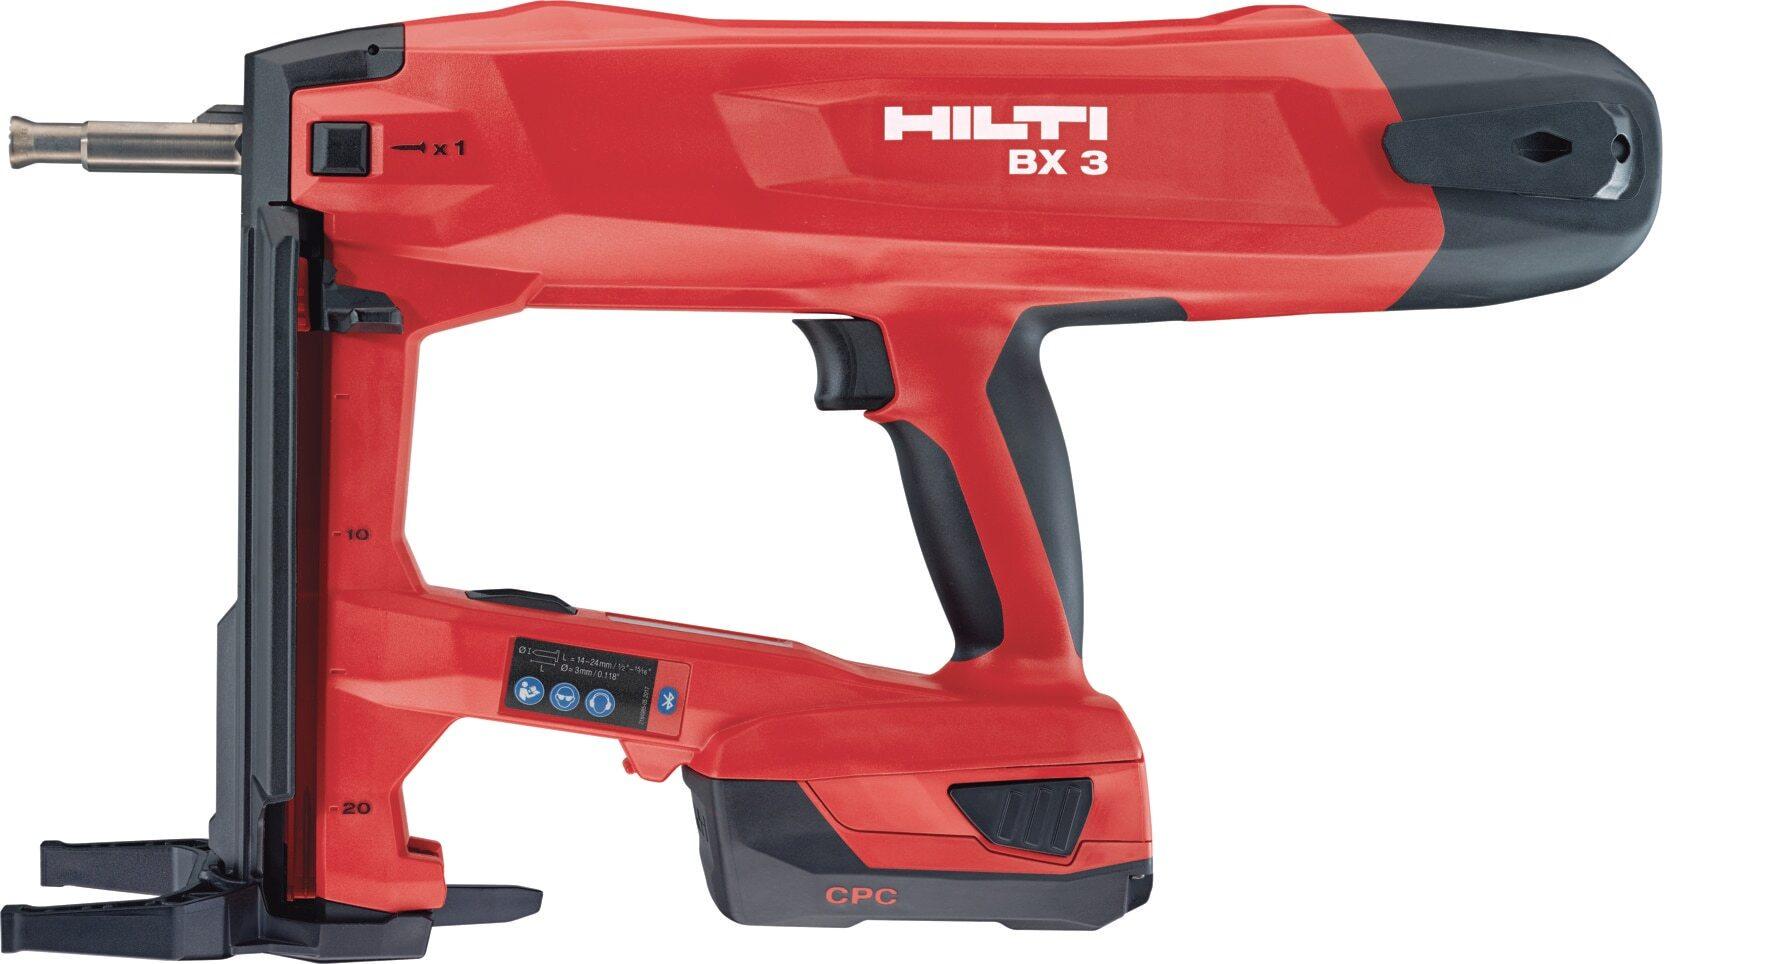 Hilti BX3 Fastening Tool 22v 3.5Kg